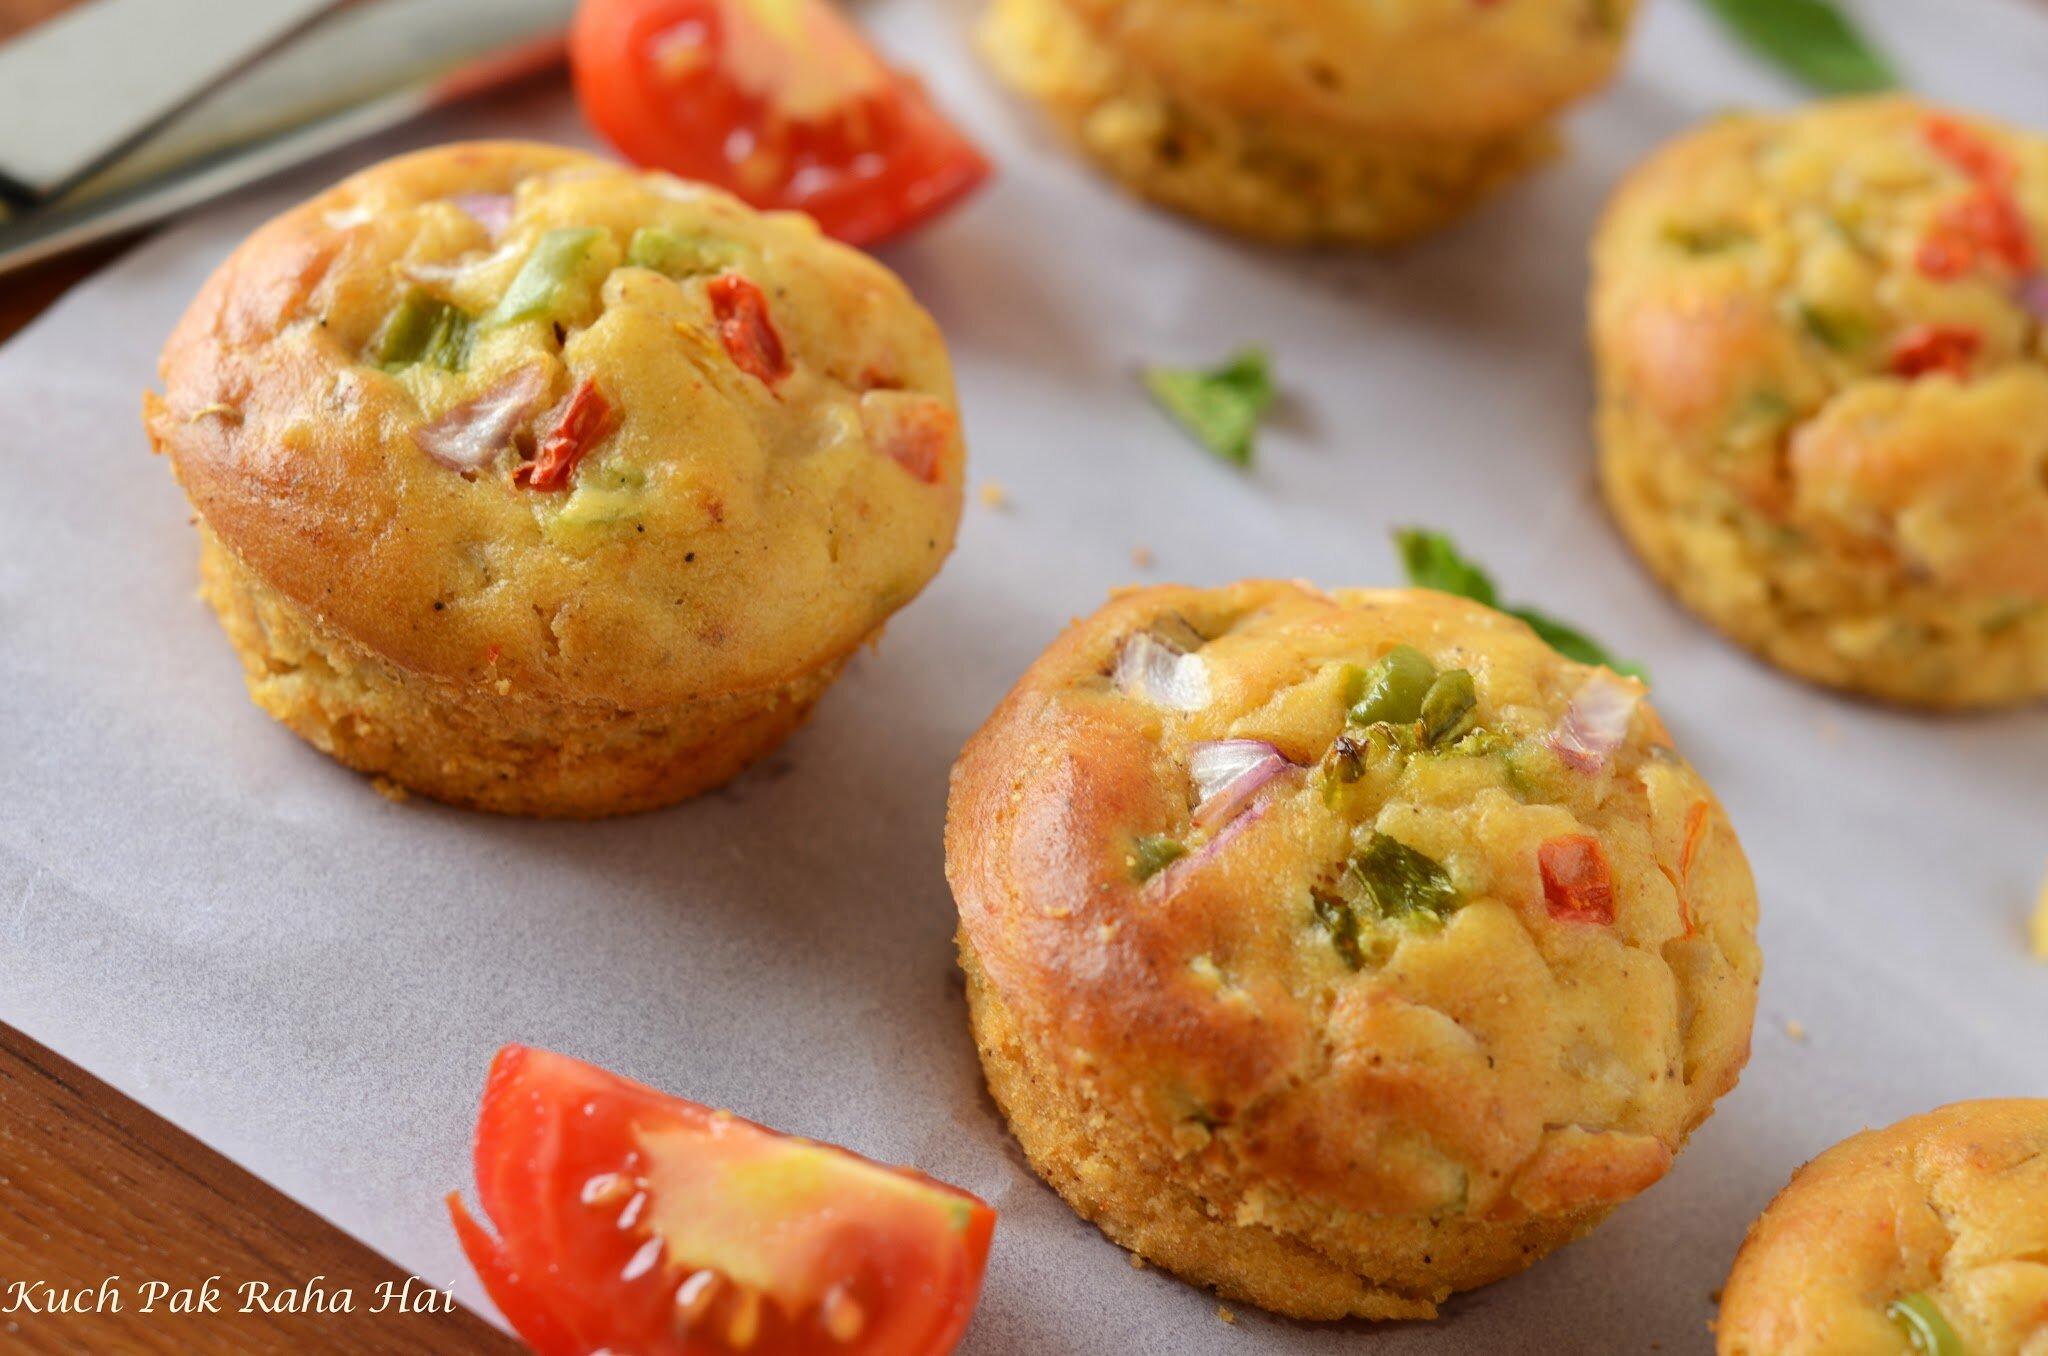 Eggless-Savoury-Breakfast-Muffins